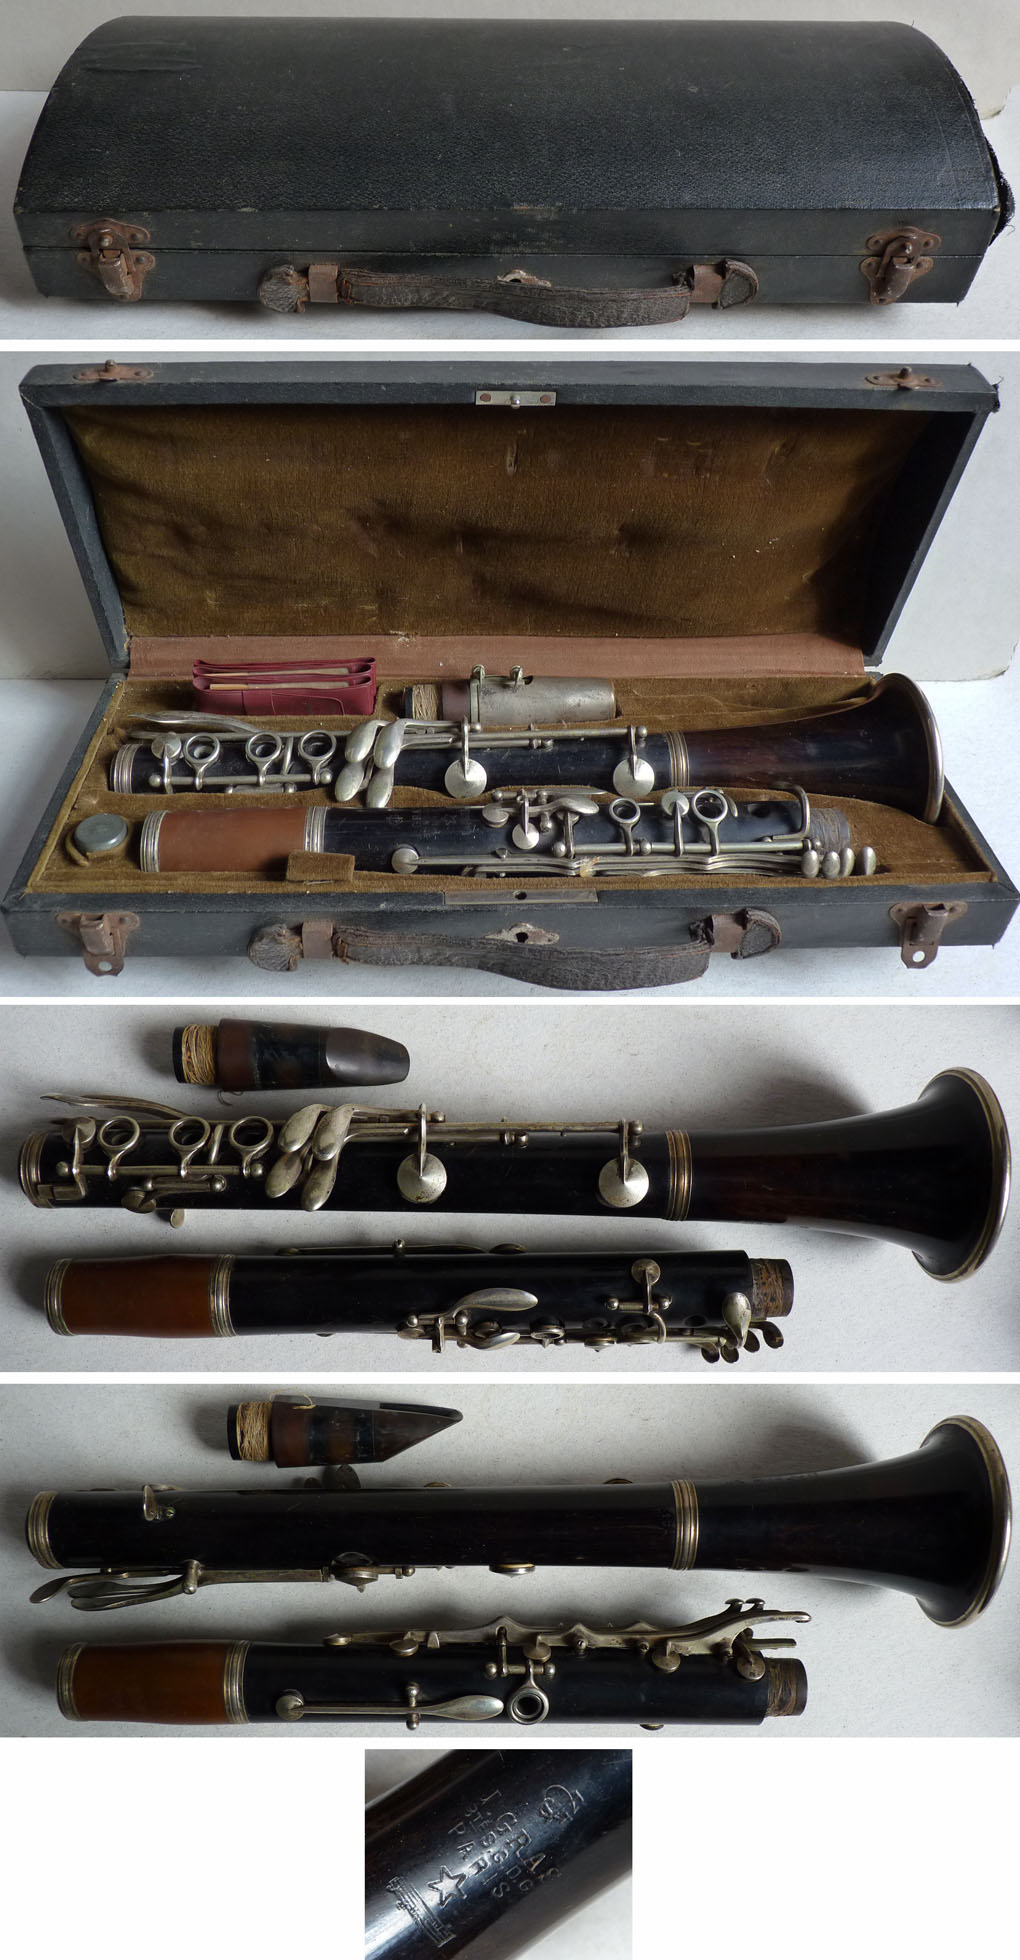 superbe clarinette en bois gras avec boite 19e si cle ebay. Black Bedroom Furniture Sets. Home Design Ideas